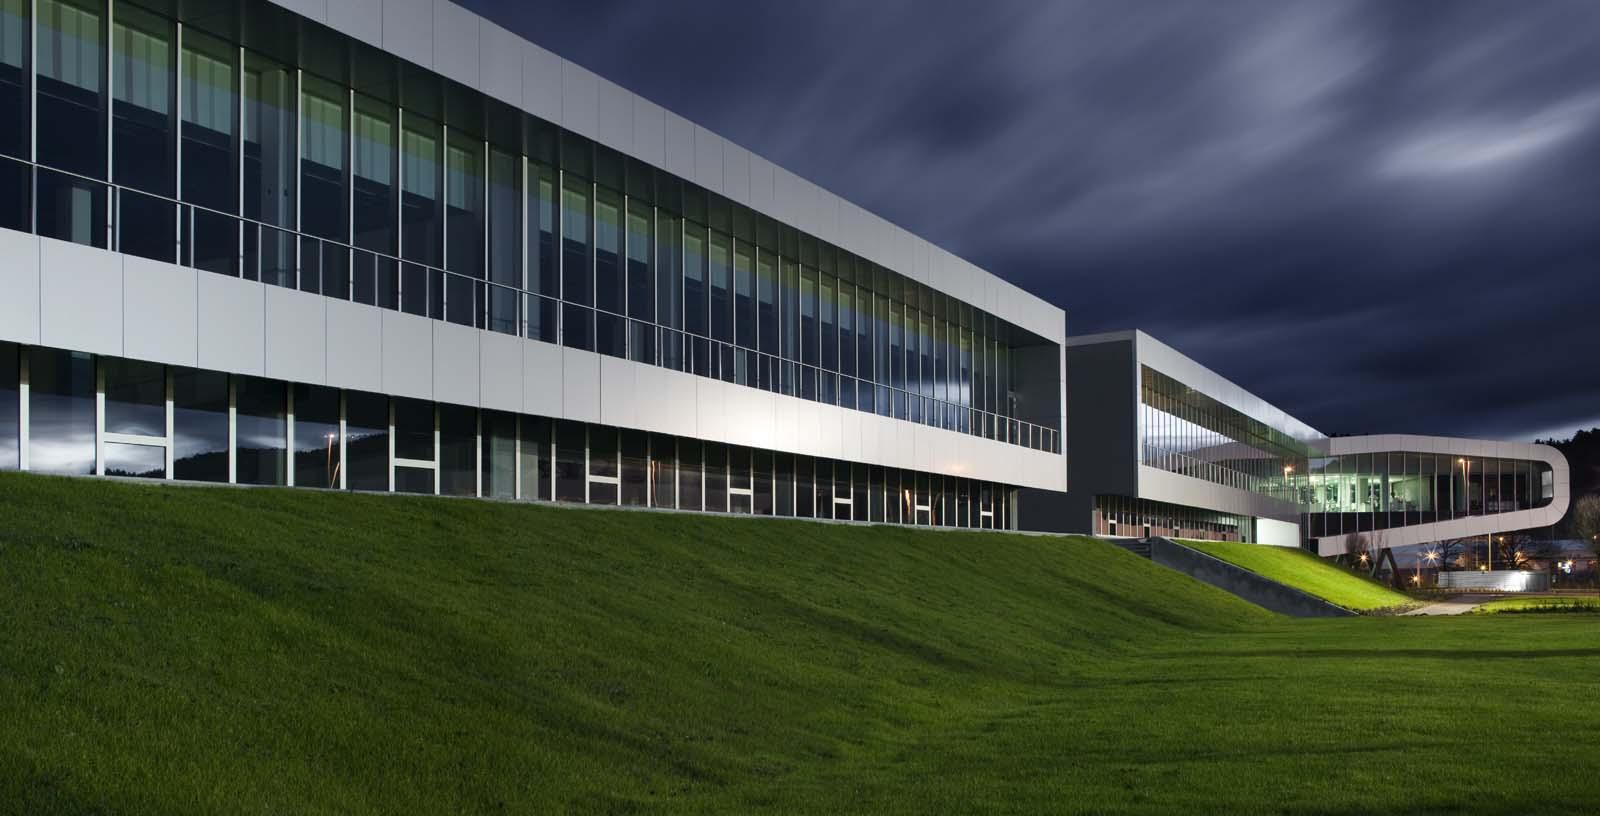 AIC_Automotive_Centre_01_Architecture_Idom_photos_Aitor_Ortiz